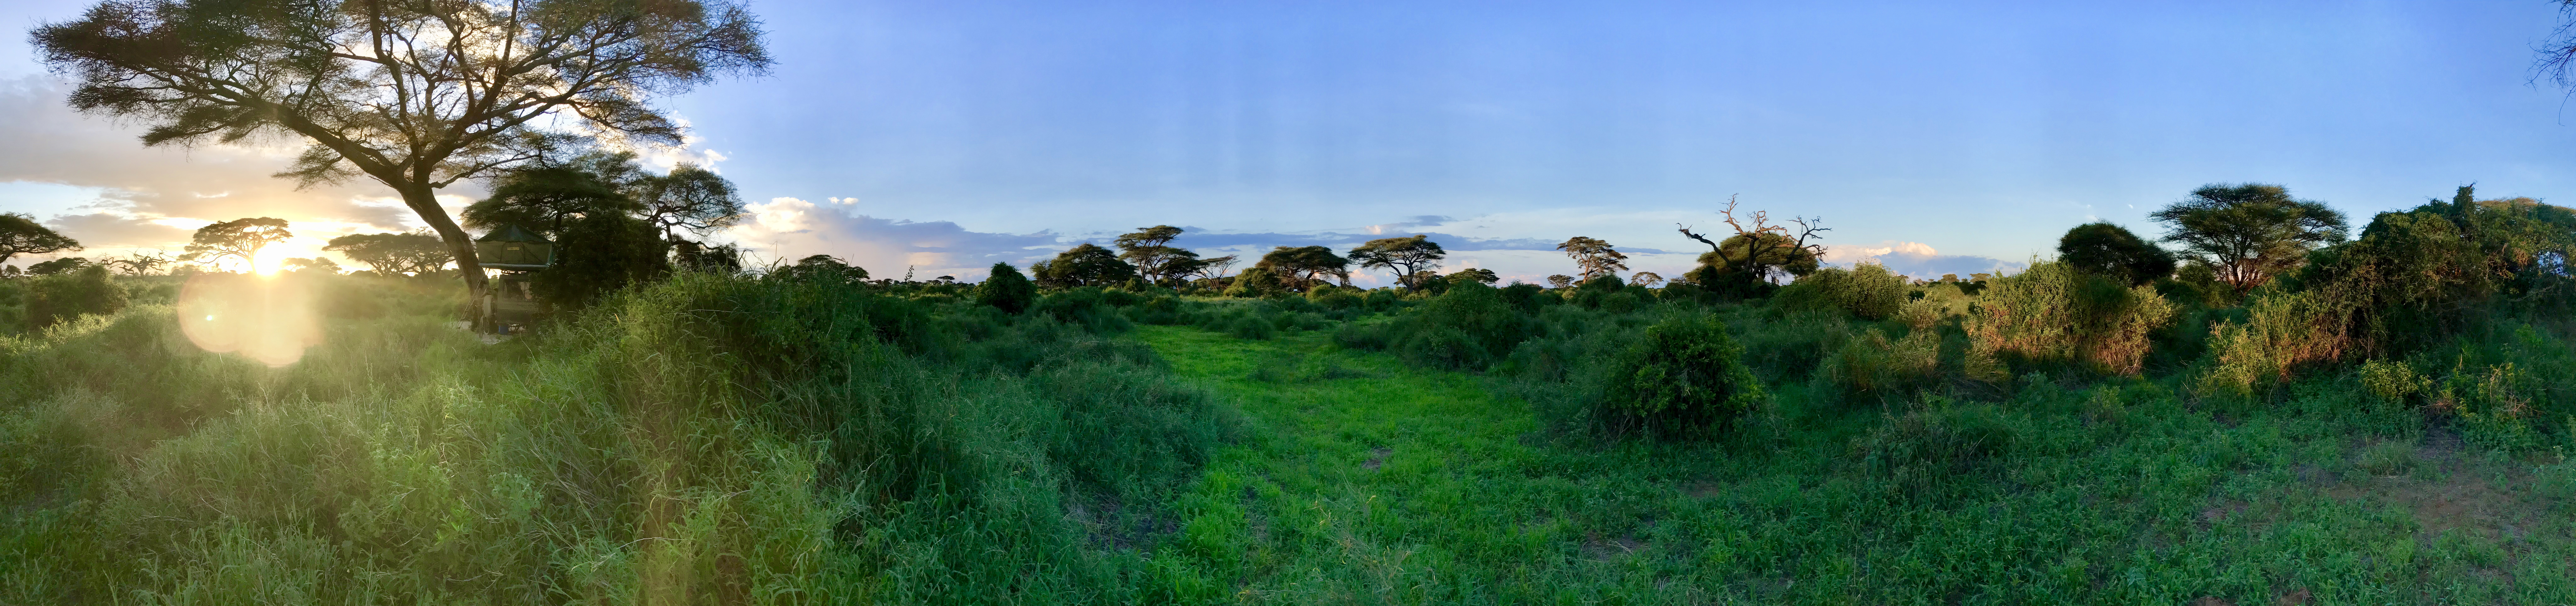 Kenya Safari-El Mundo Safaris